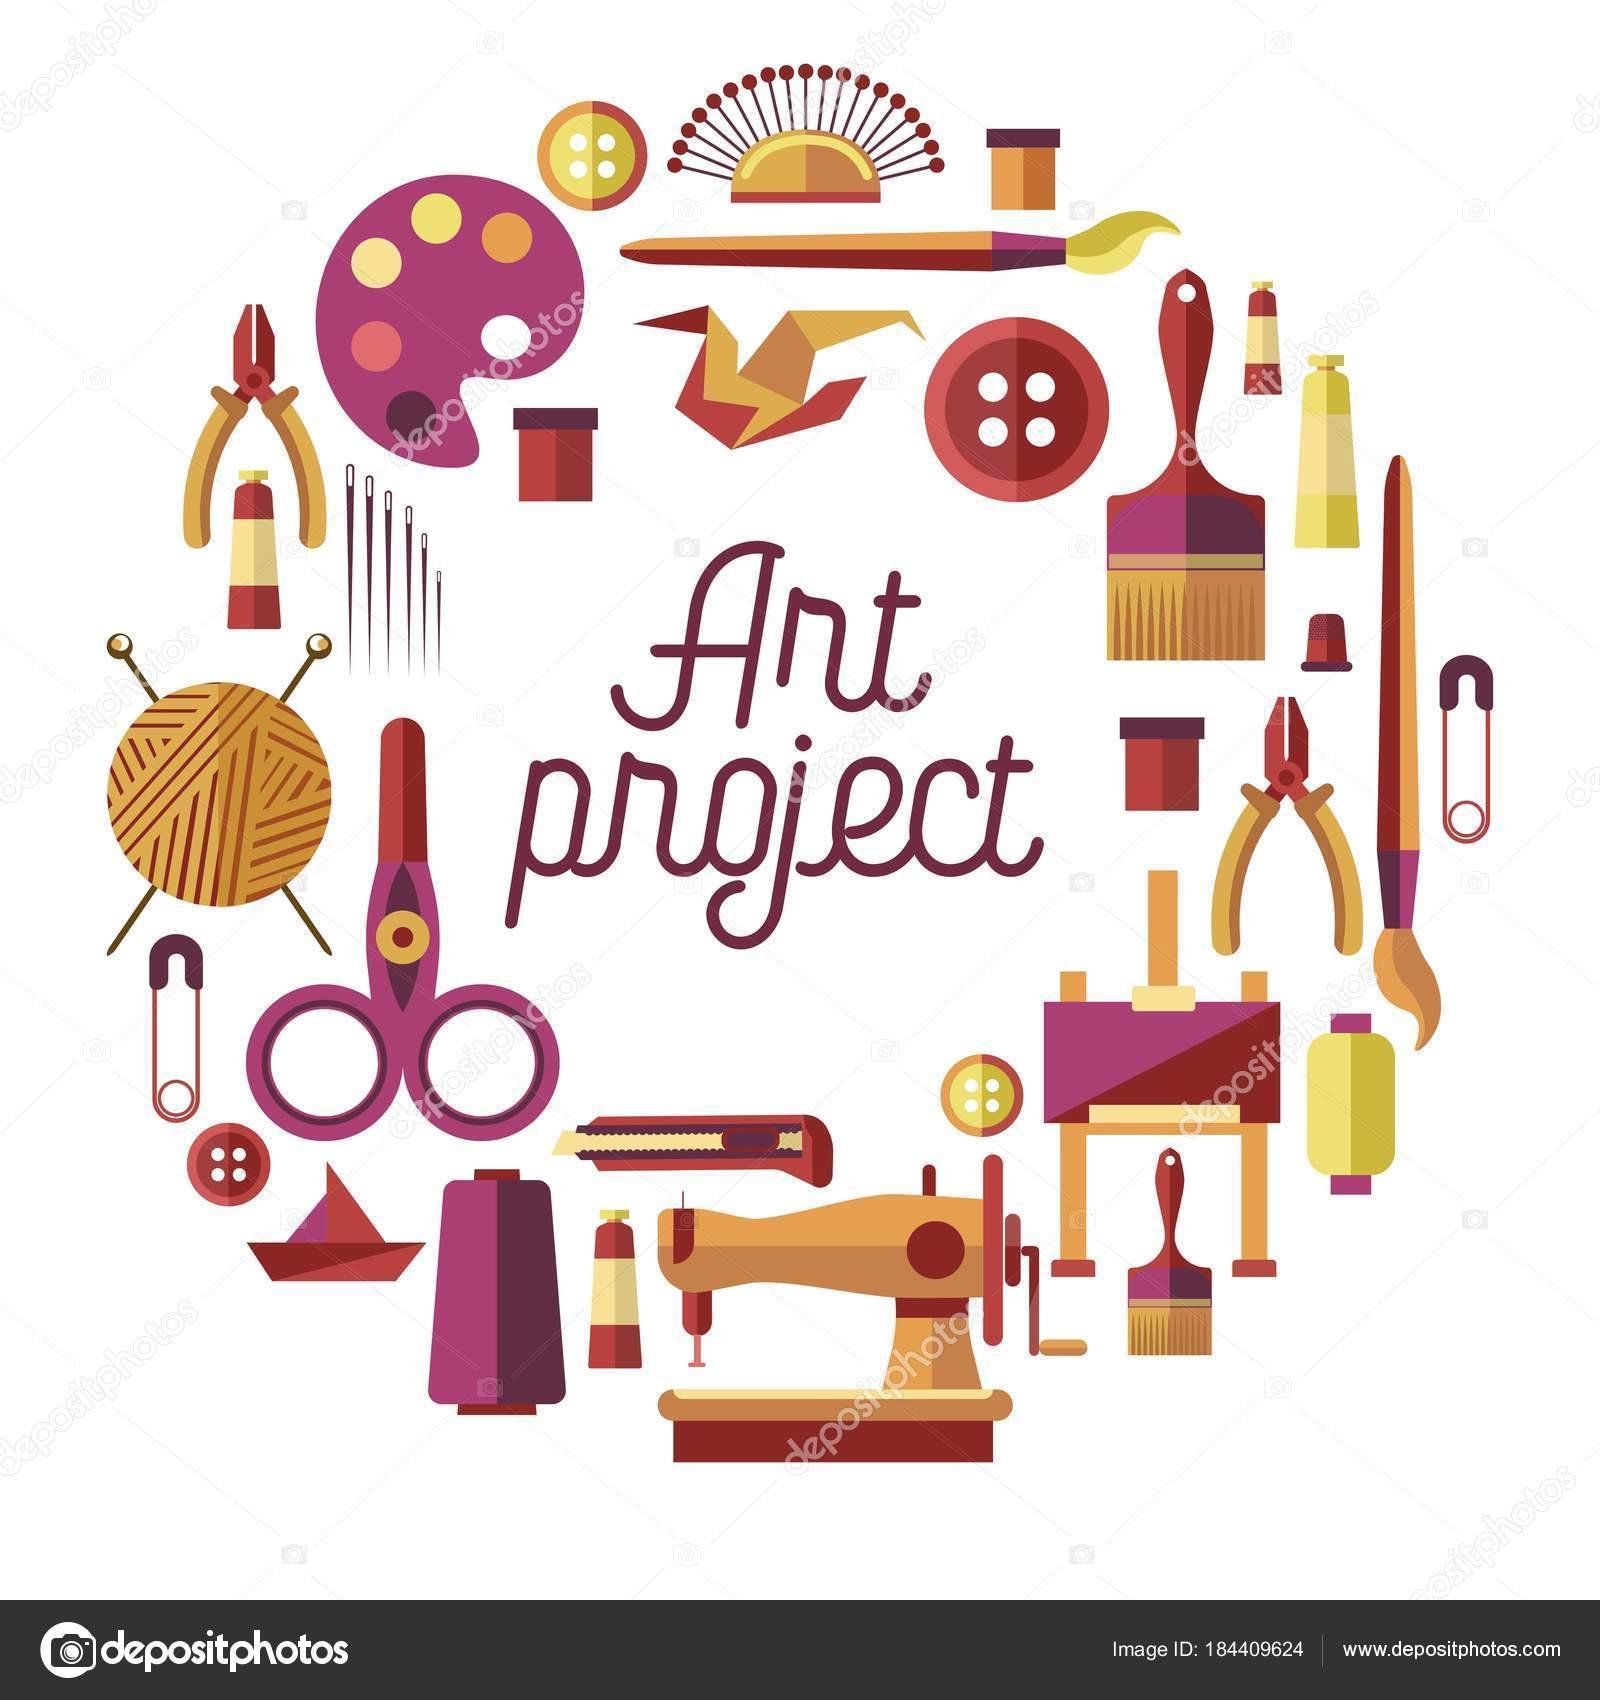 Art Project Handicraft Classes Poster Creative Craft Workshop Diy